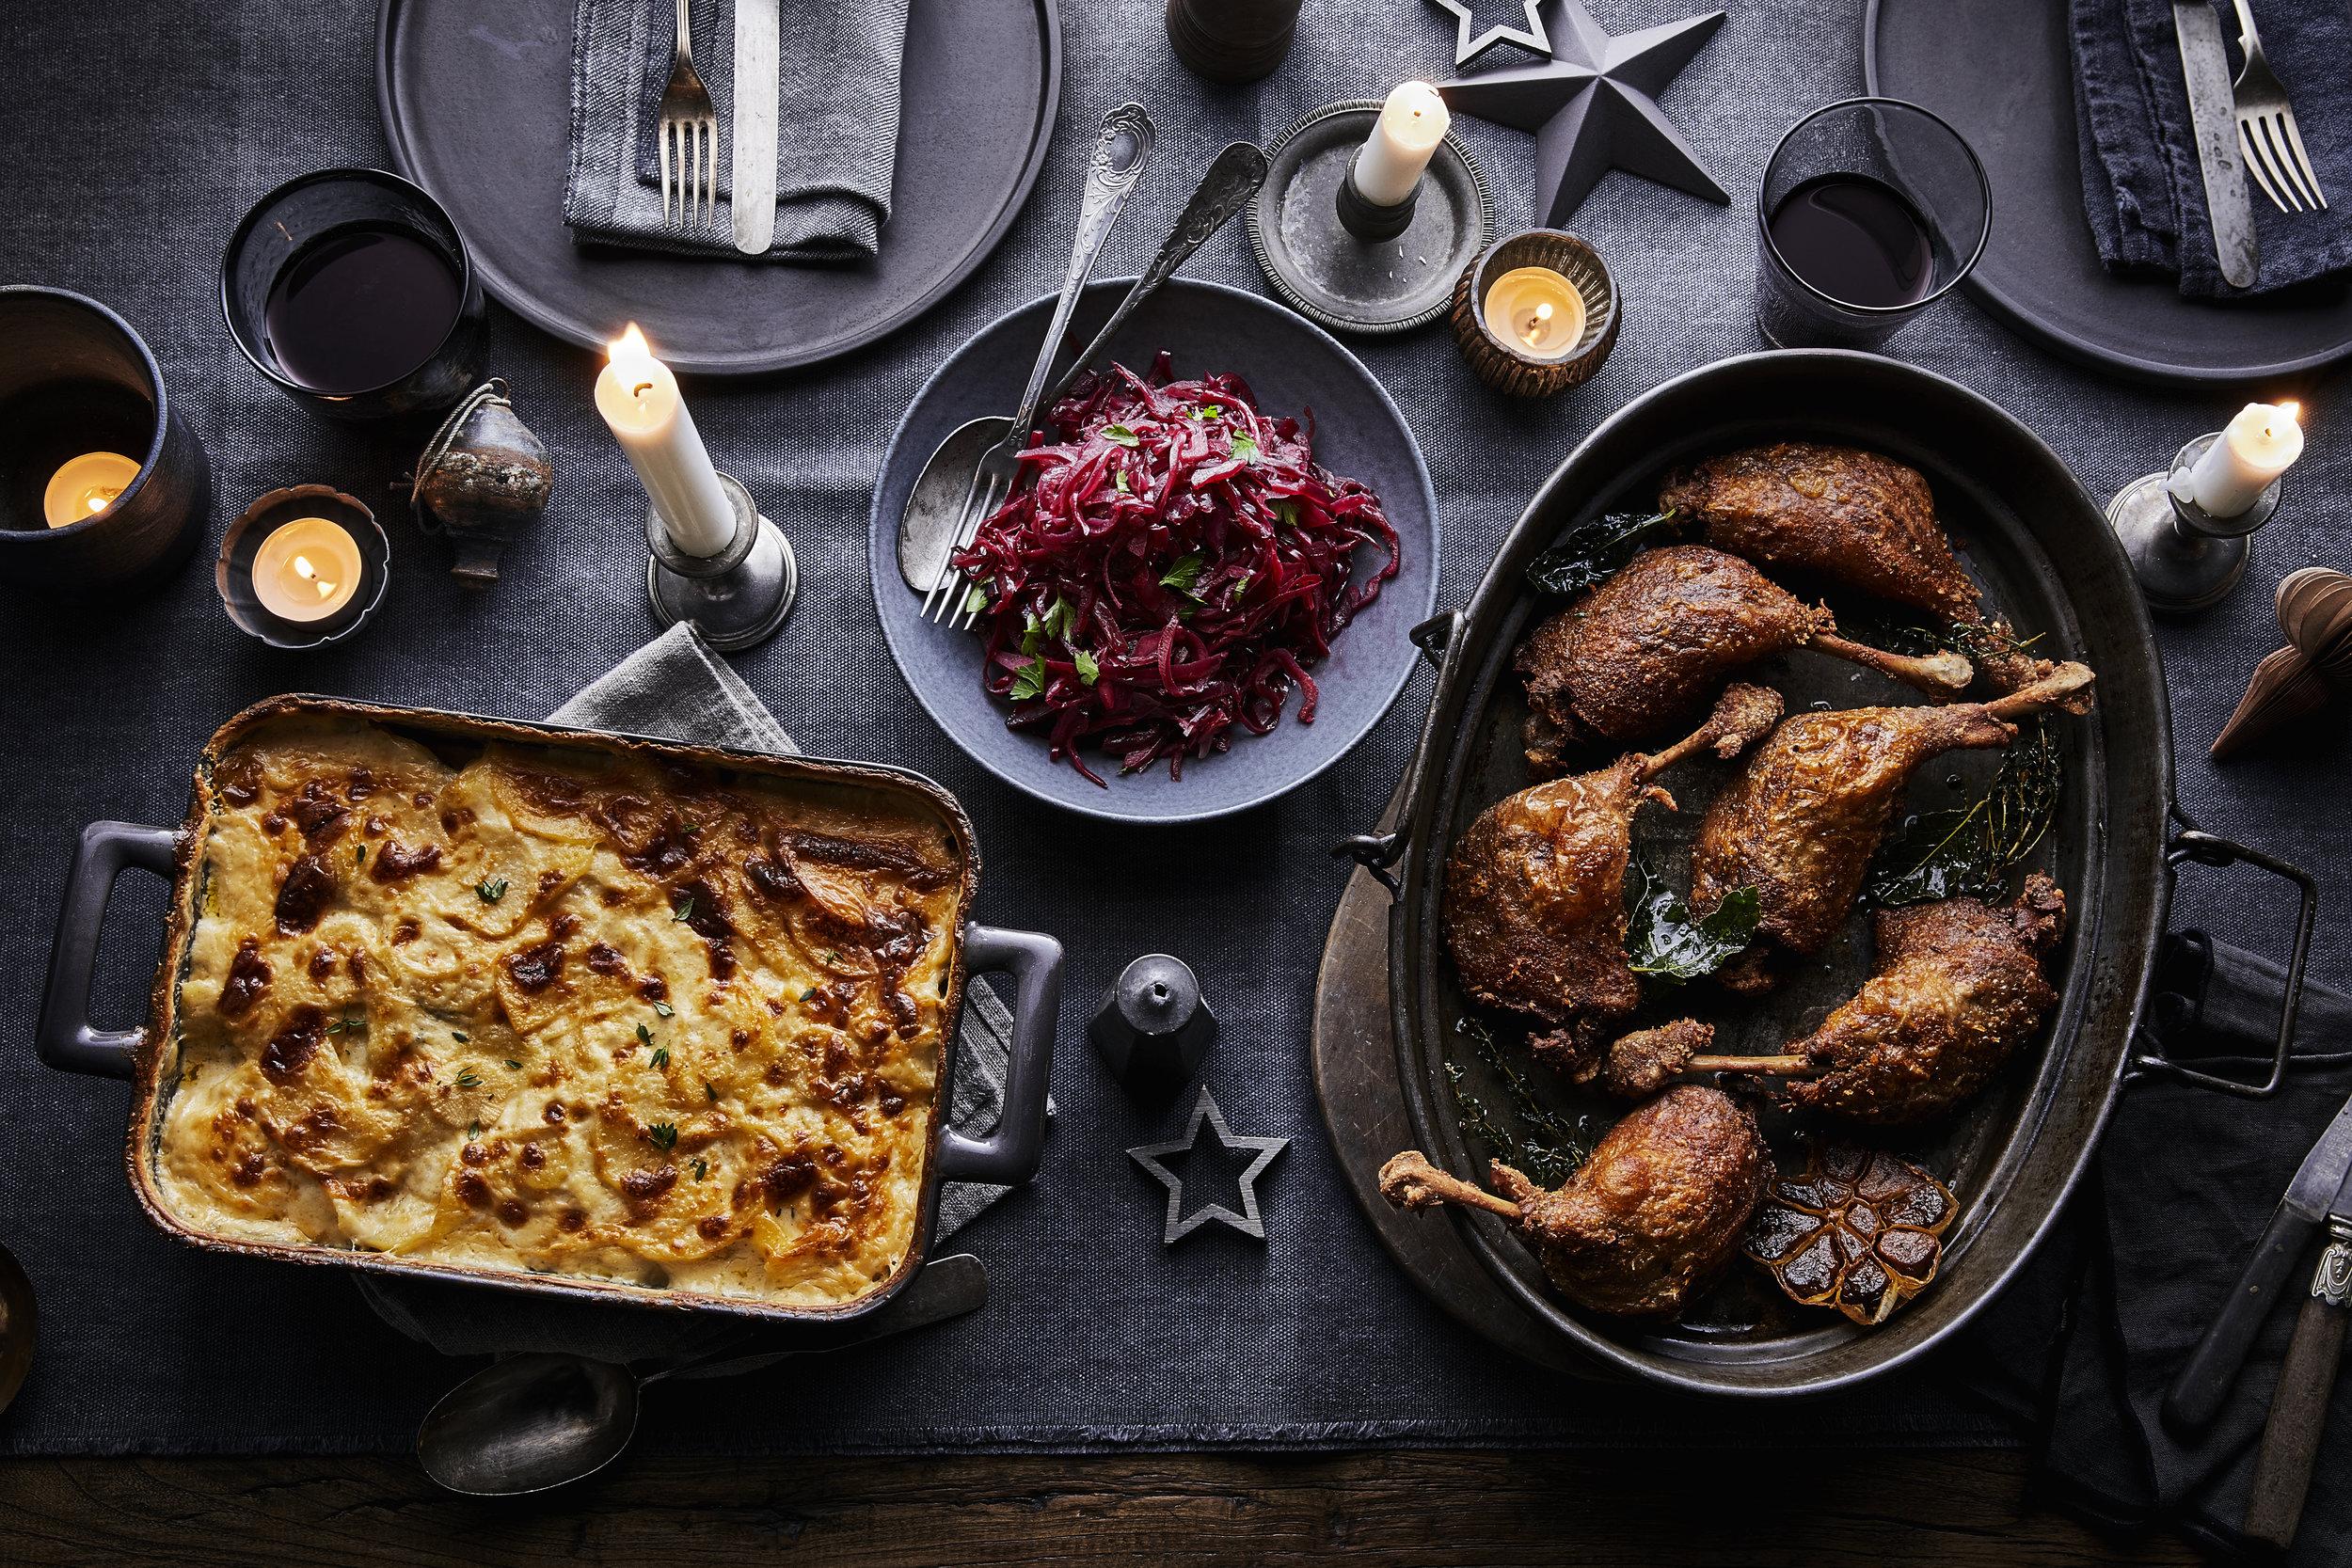 Food Stylist: Nicola Roberts